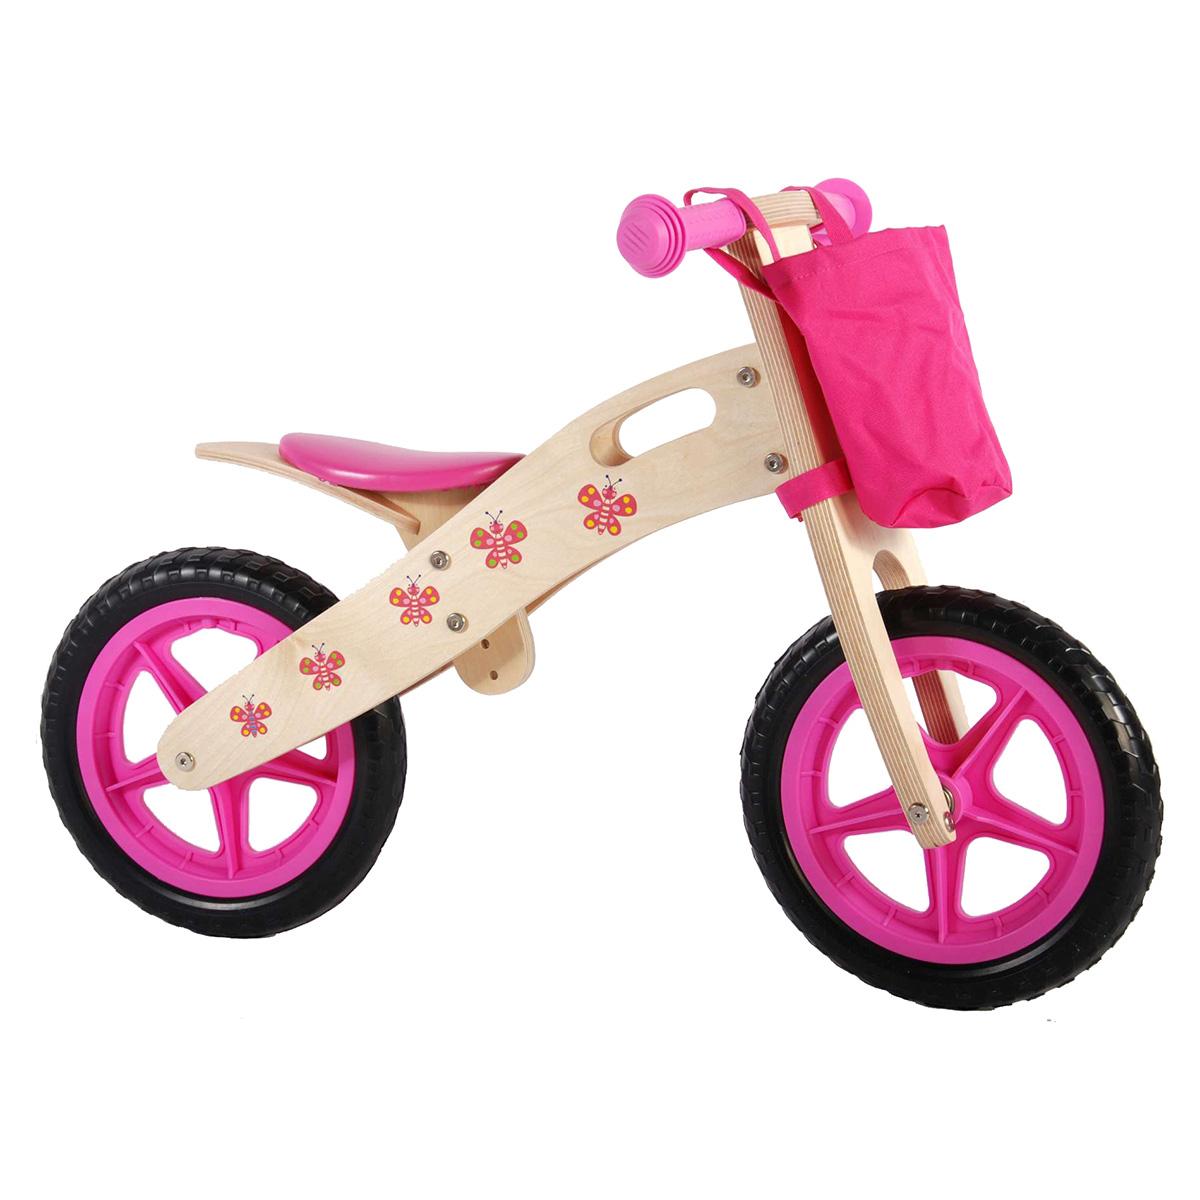 "Yipeeh løbecykel 12"" - Sommerfugl"